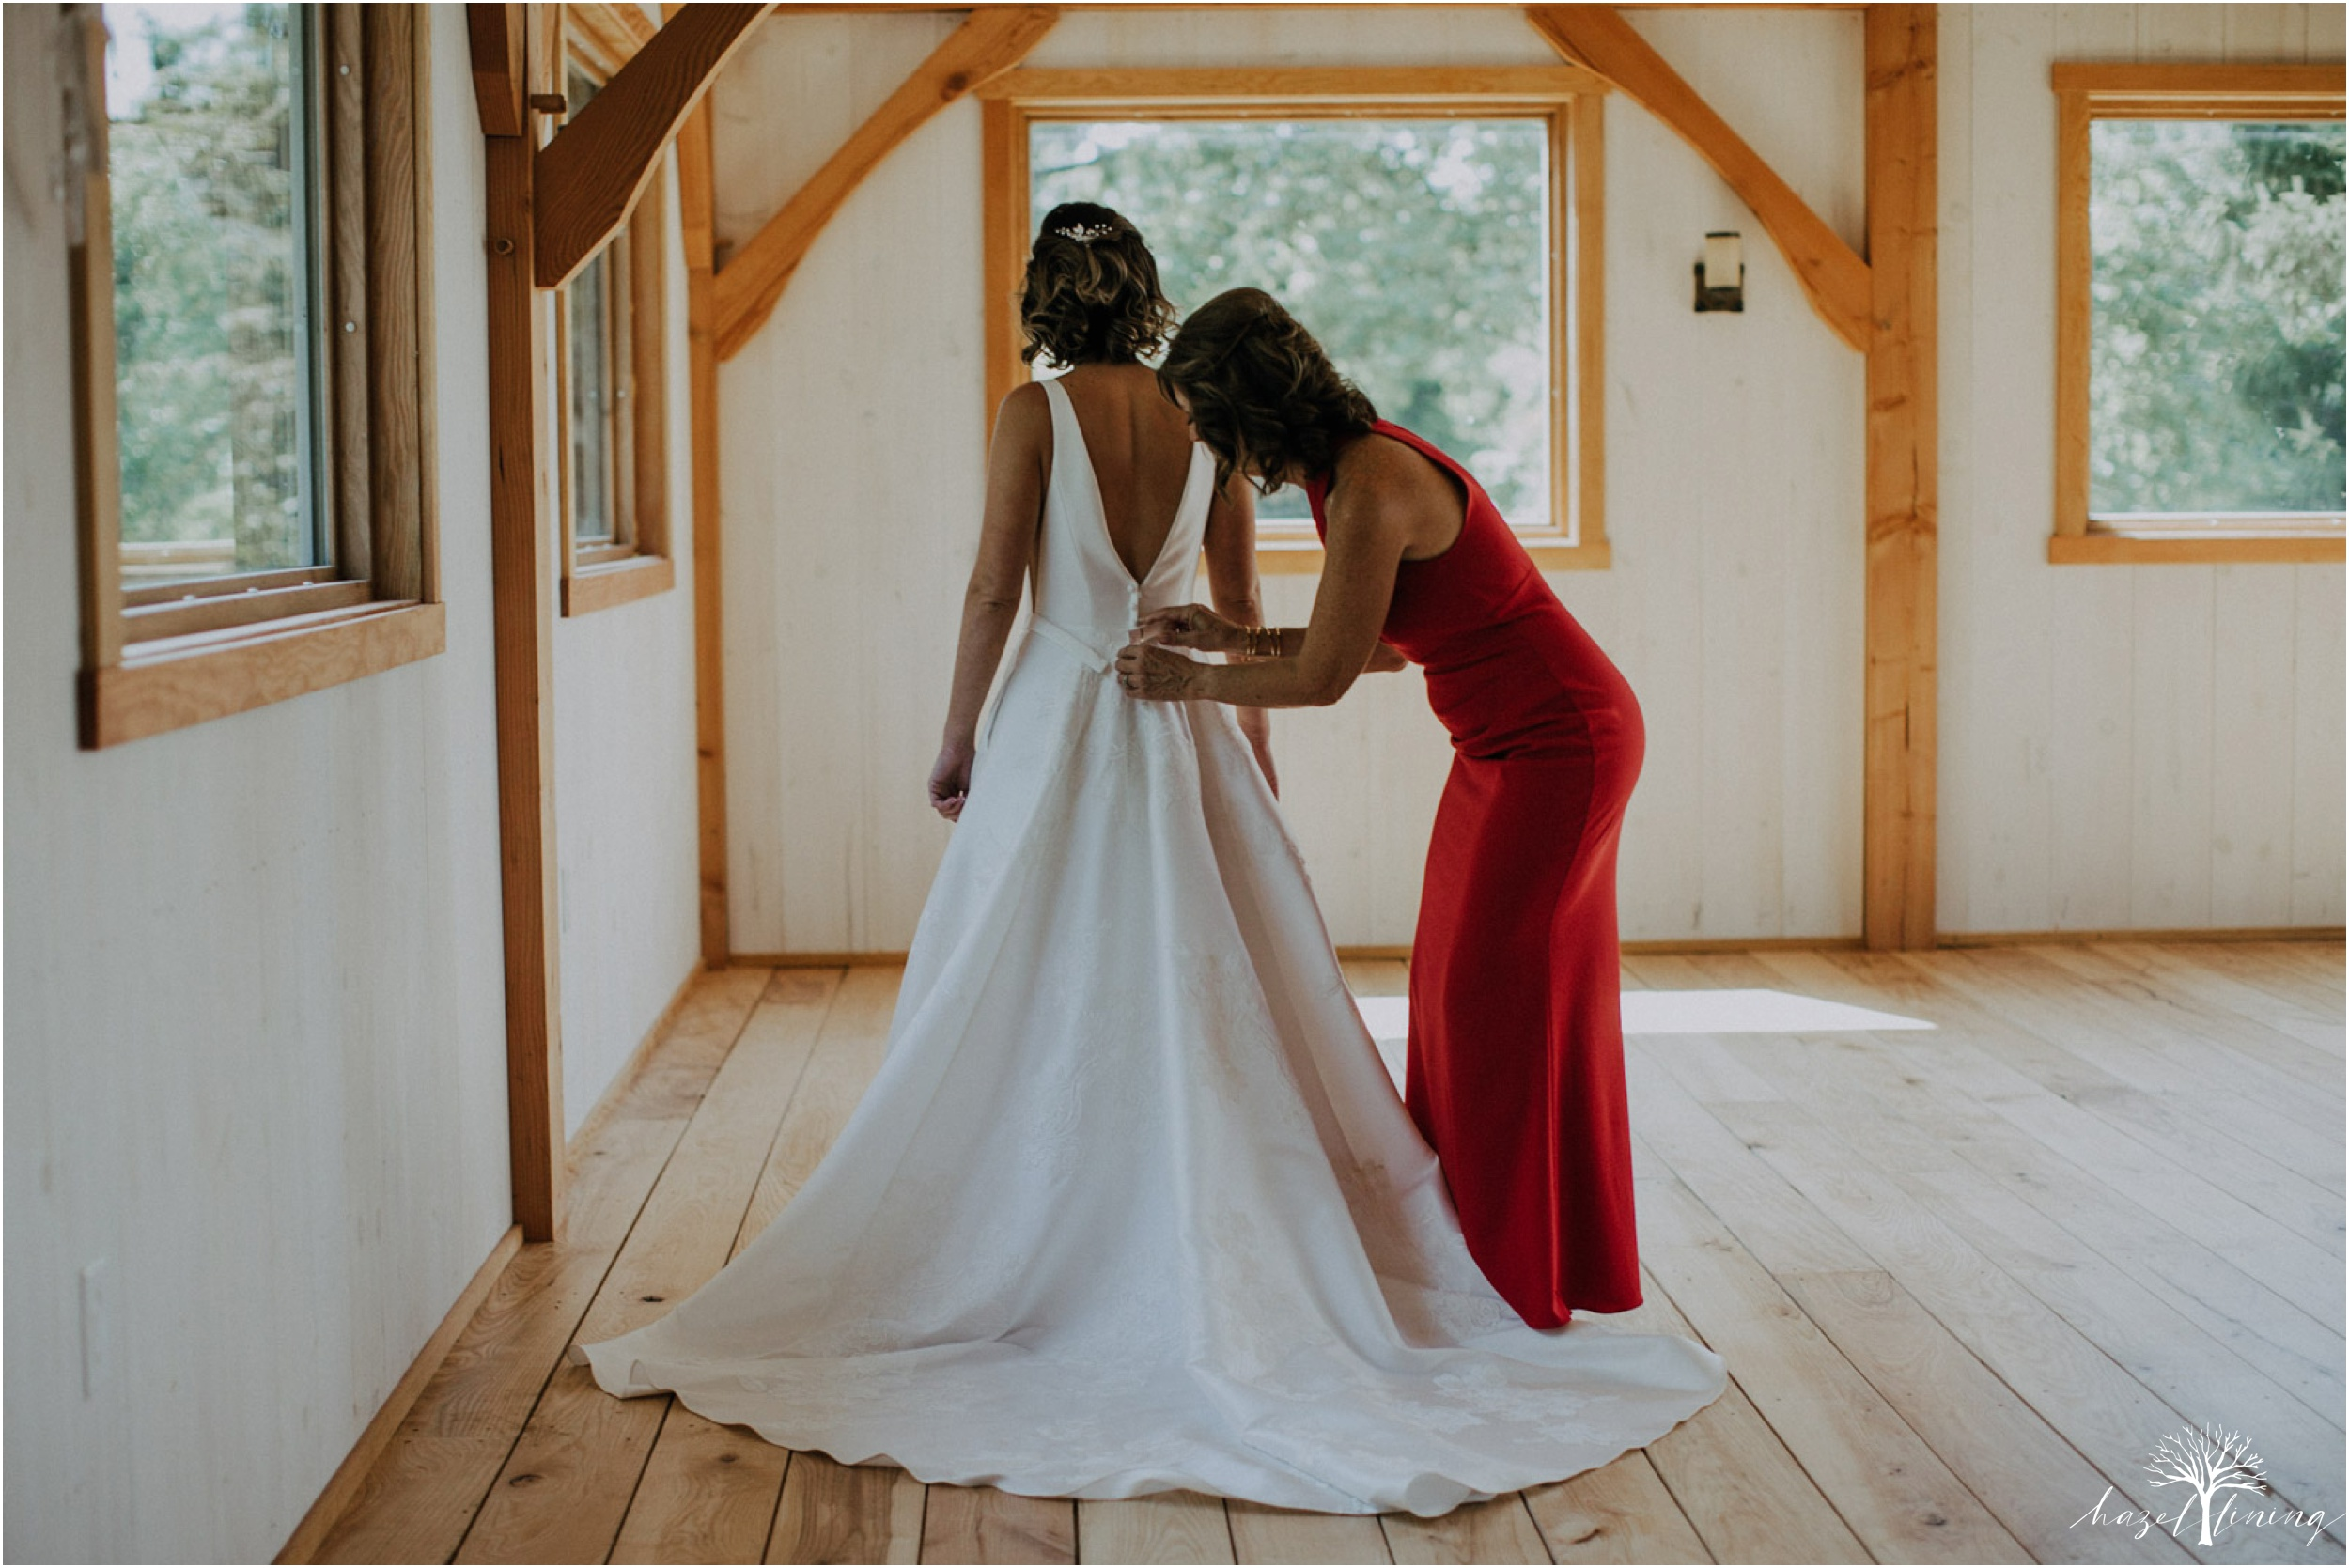 maureen-hepner-anthony-giordano-rose-bank-winery-newtow-pennsylvania-luxury-summer-wedding-hazel-lining-photography-destination-elopement-wedding-engagement-photography_0014.jpg